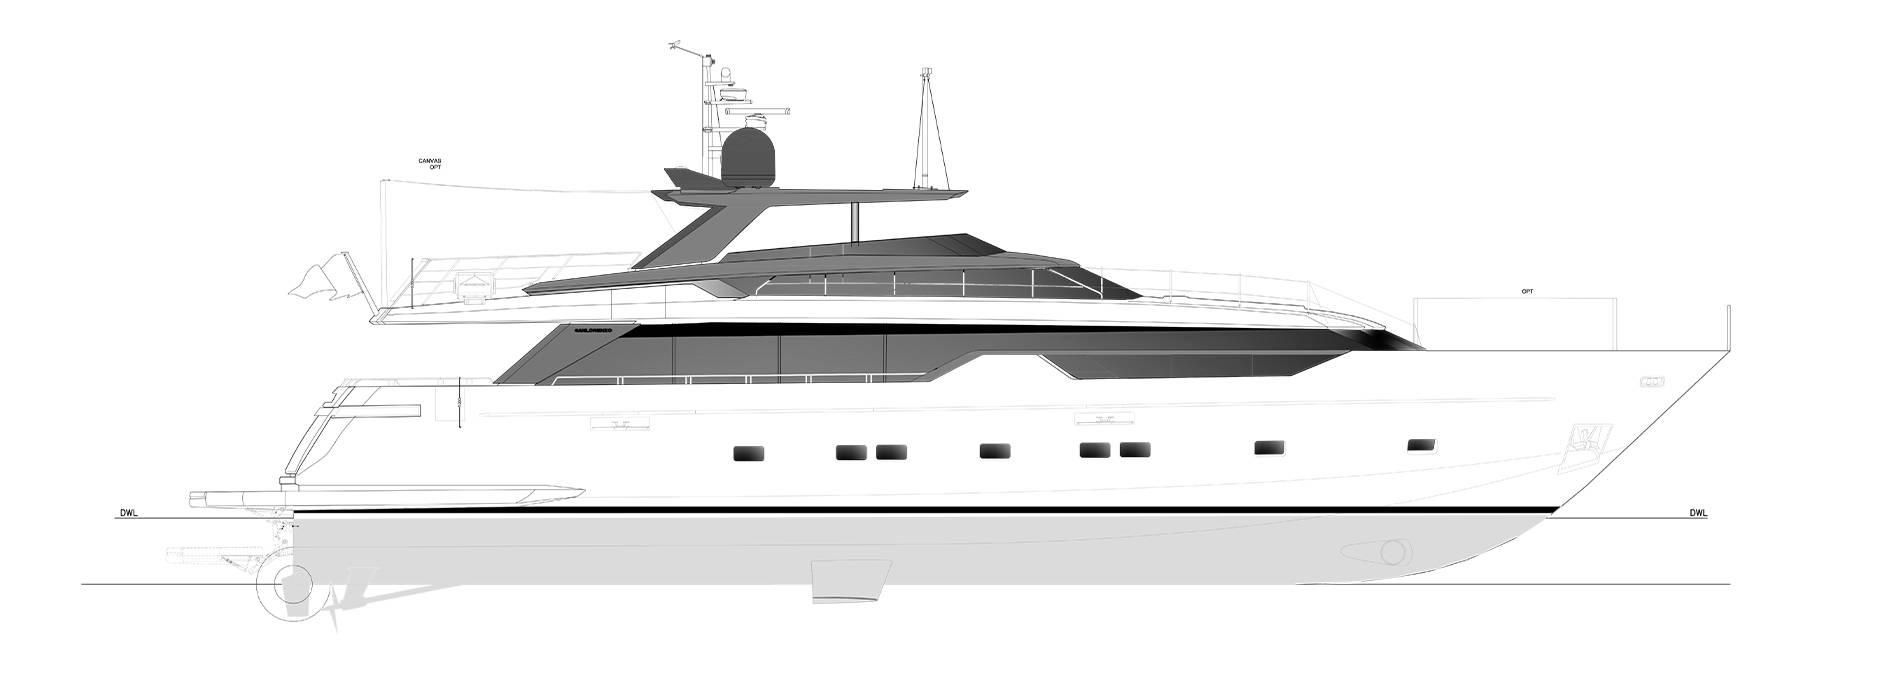 Sanlorenzo Yachts SL102A-746 under offer Profil